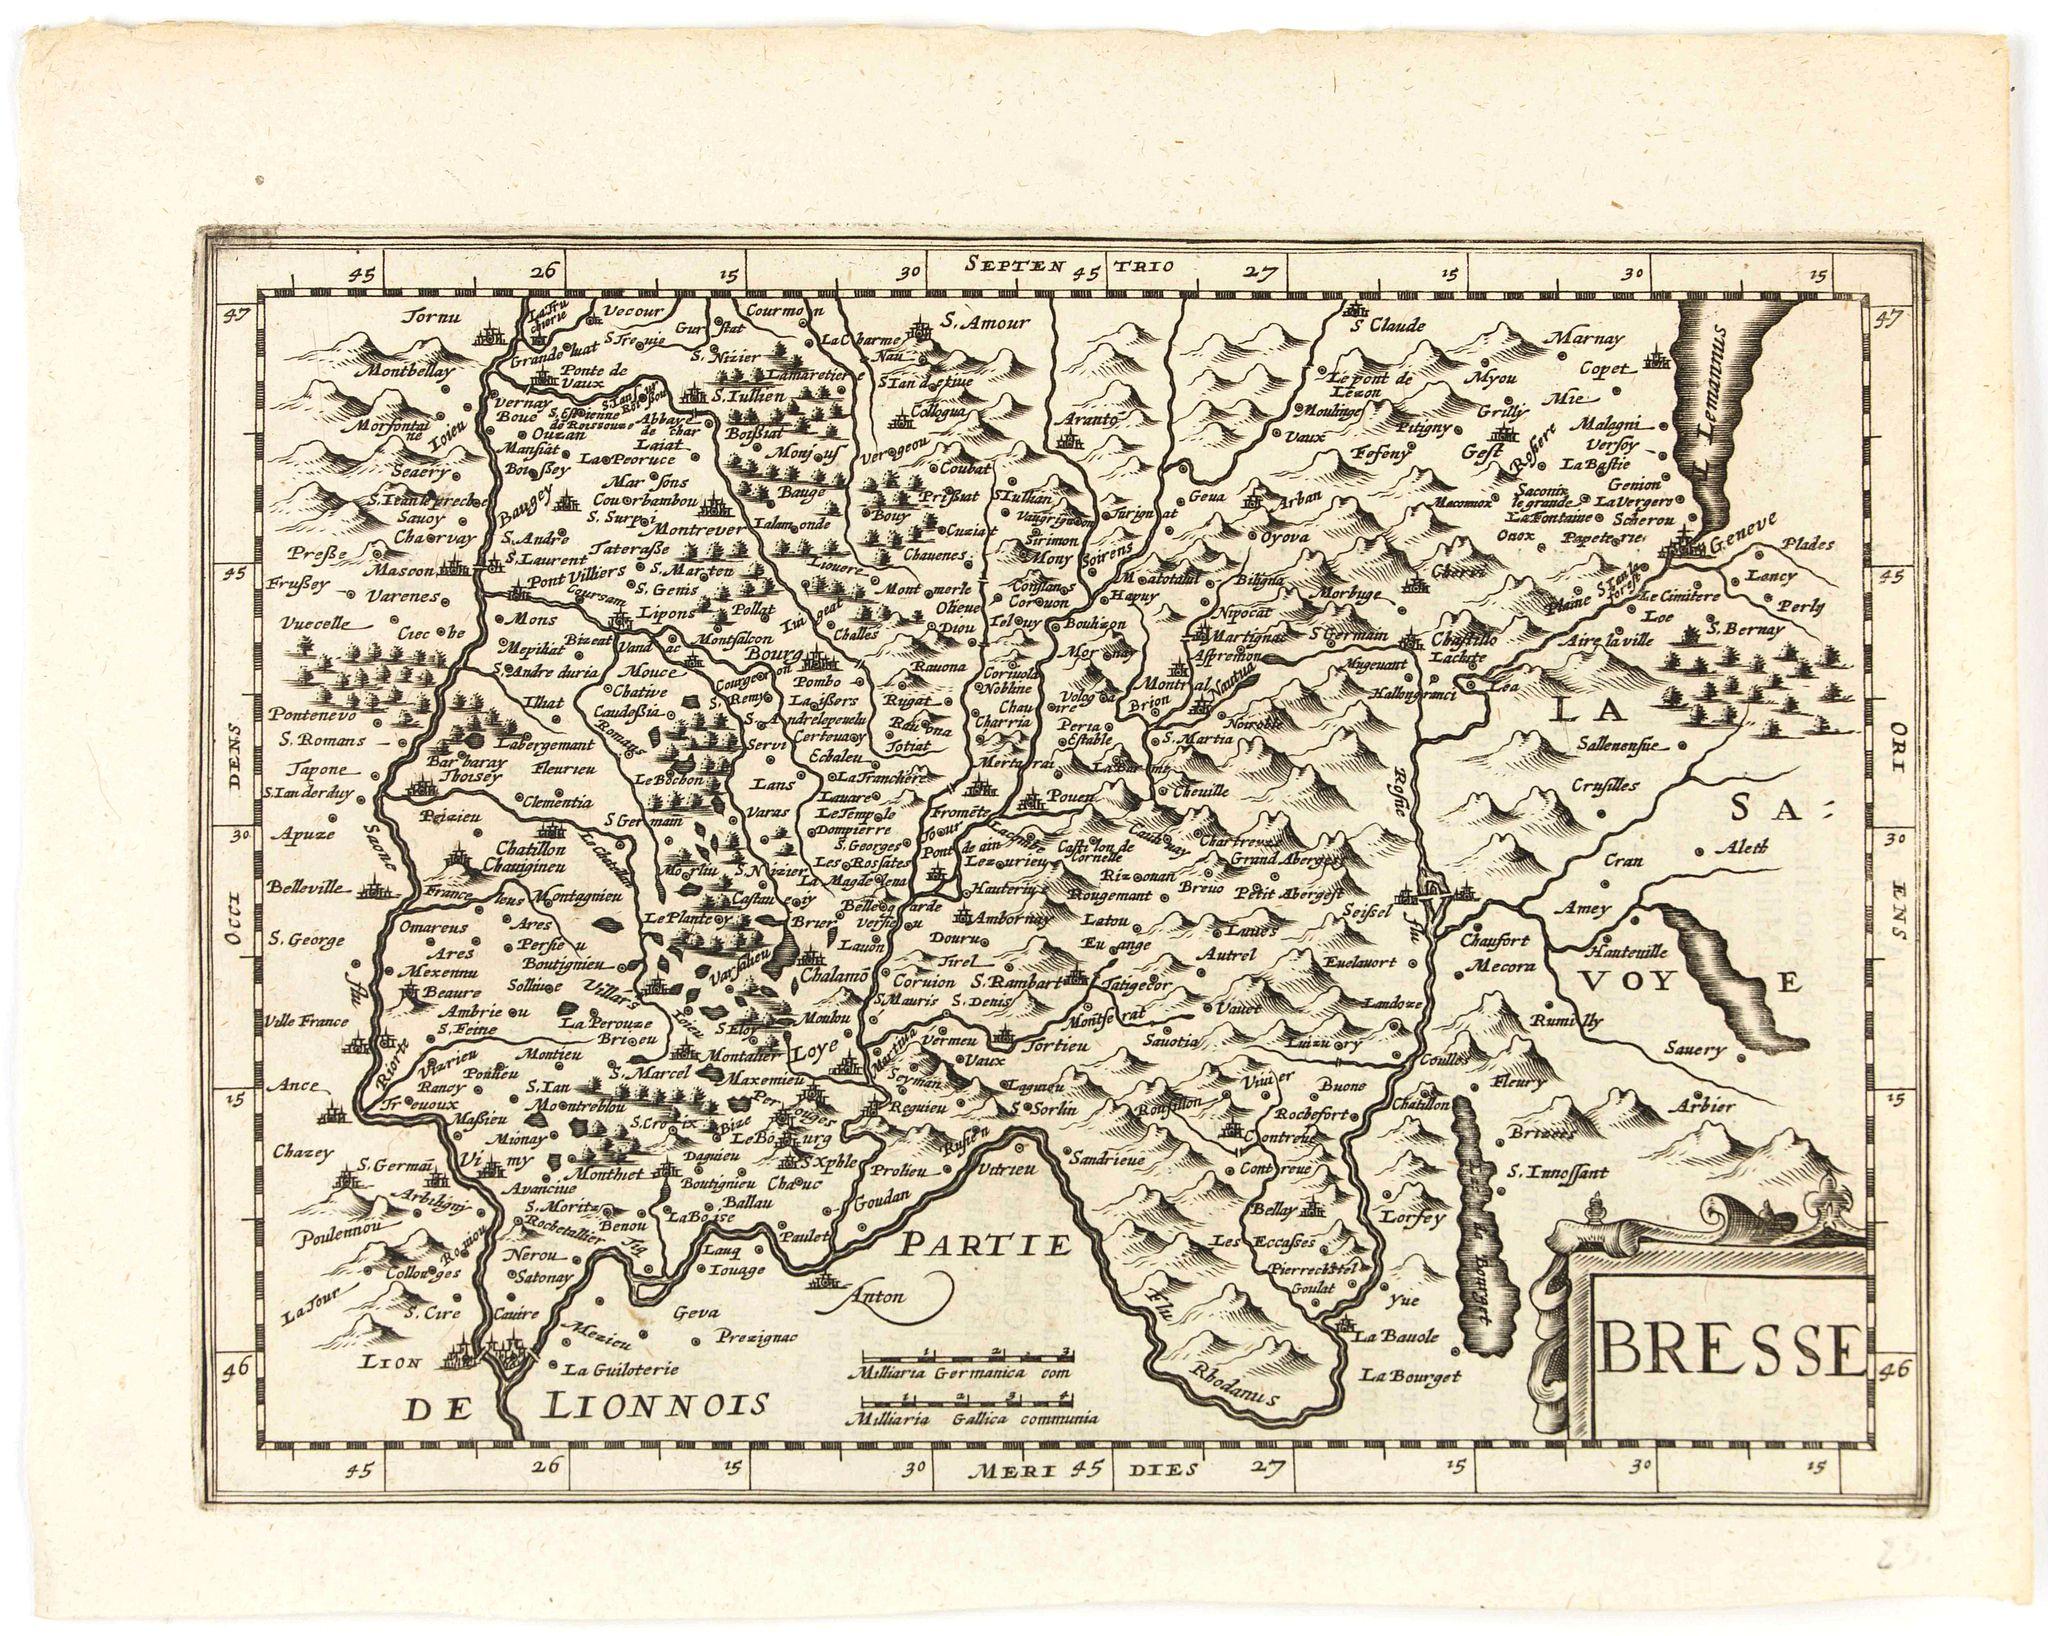 CLOPPENBURGH, J.E. -  Bresse.